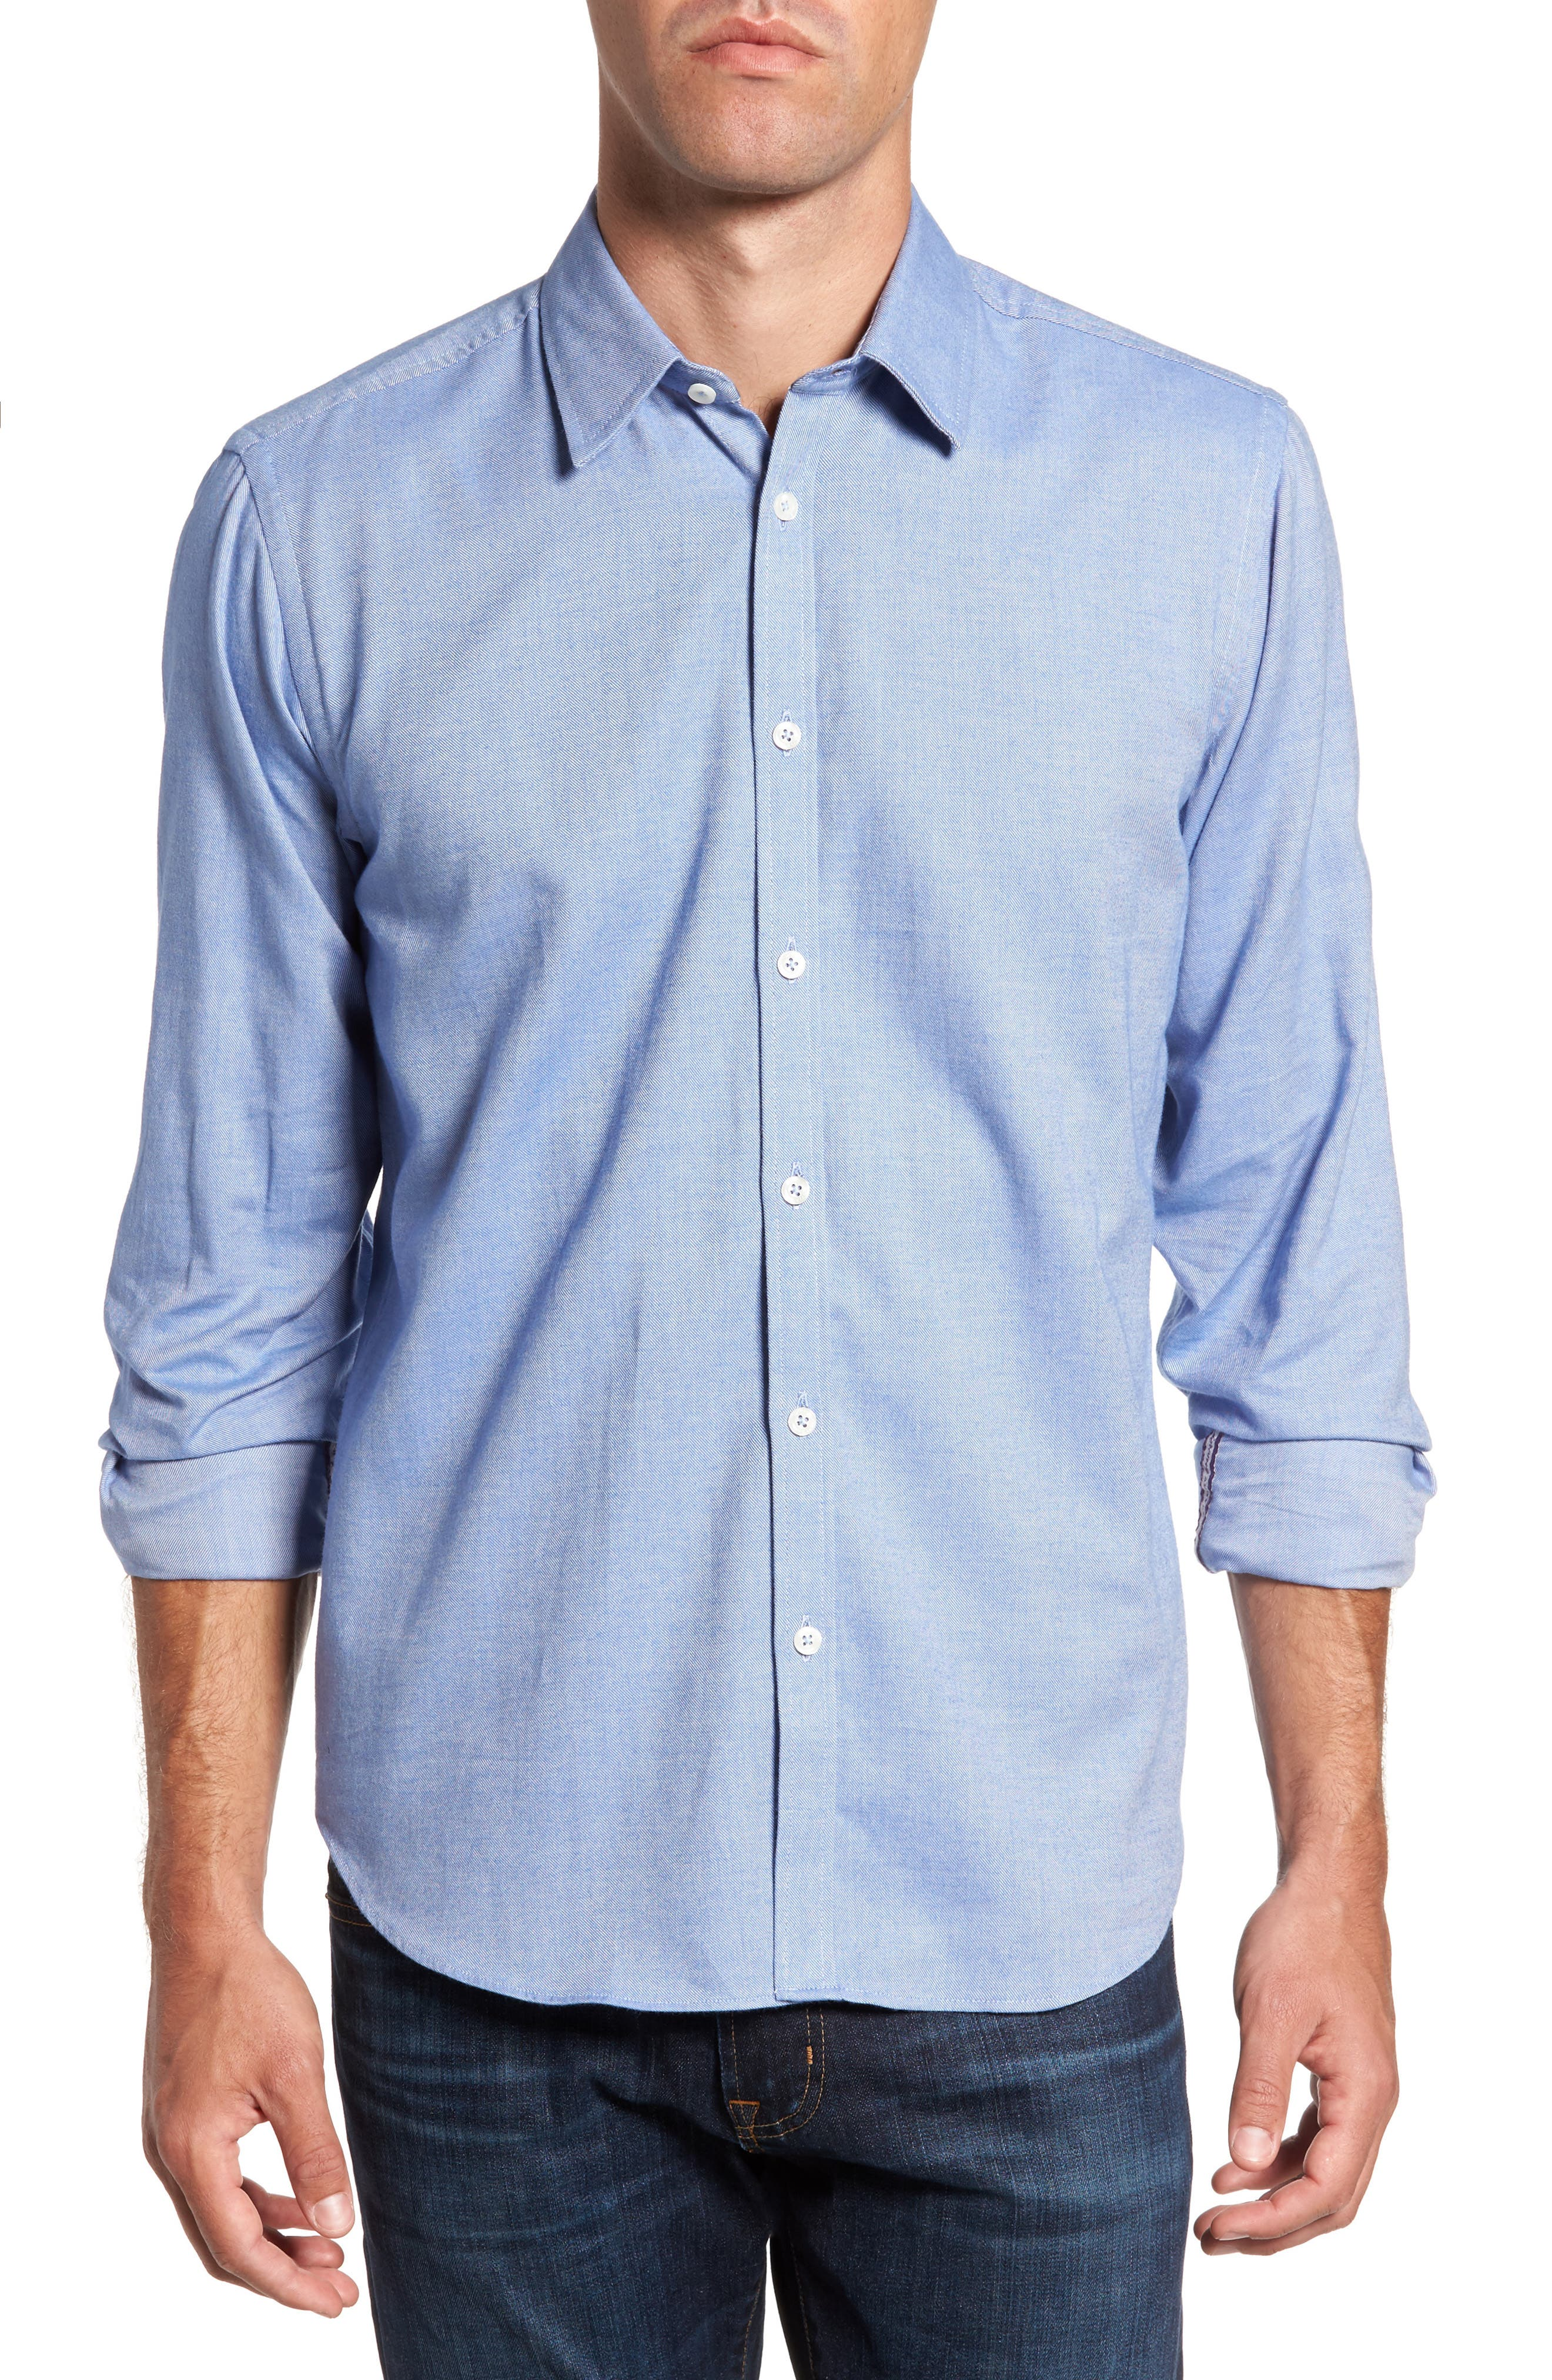 Main Image - Jeremy Argyle Slim Fit Oxford Cloth Sport Shirt